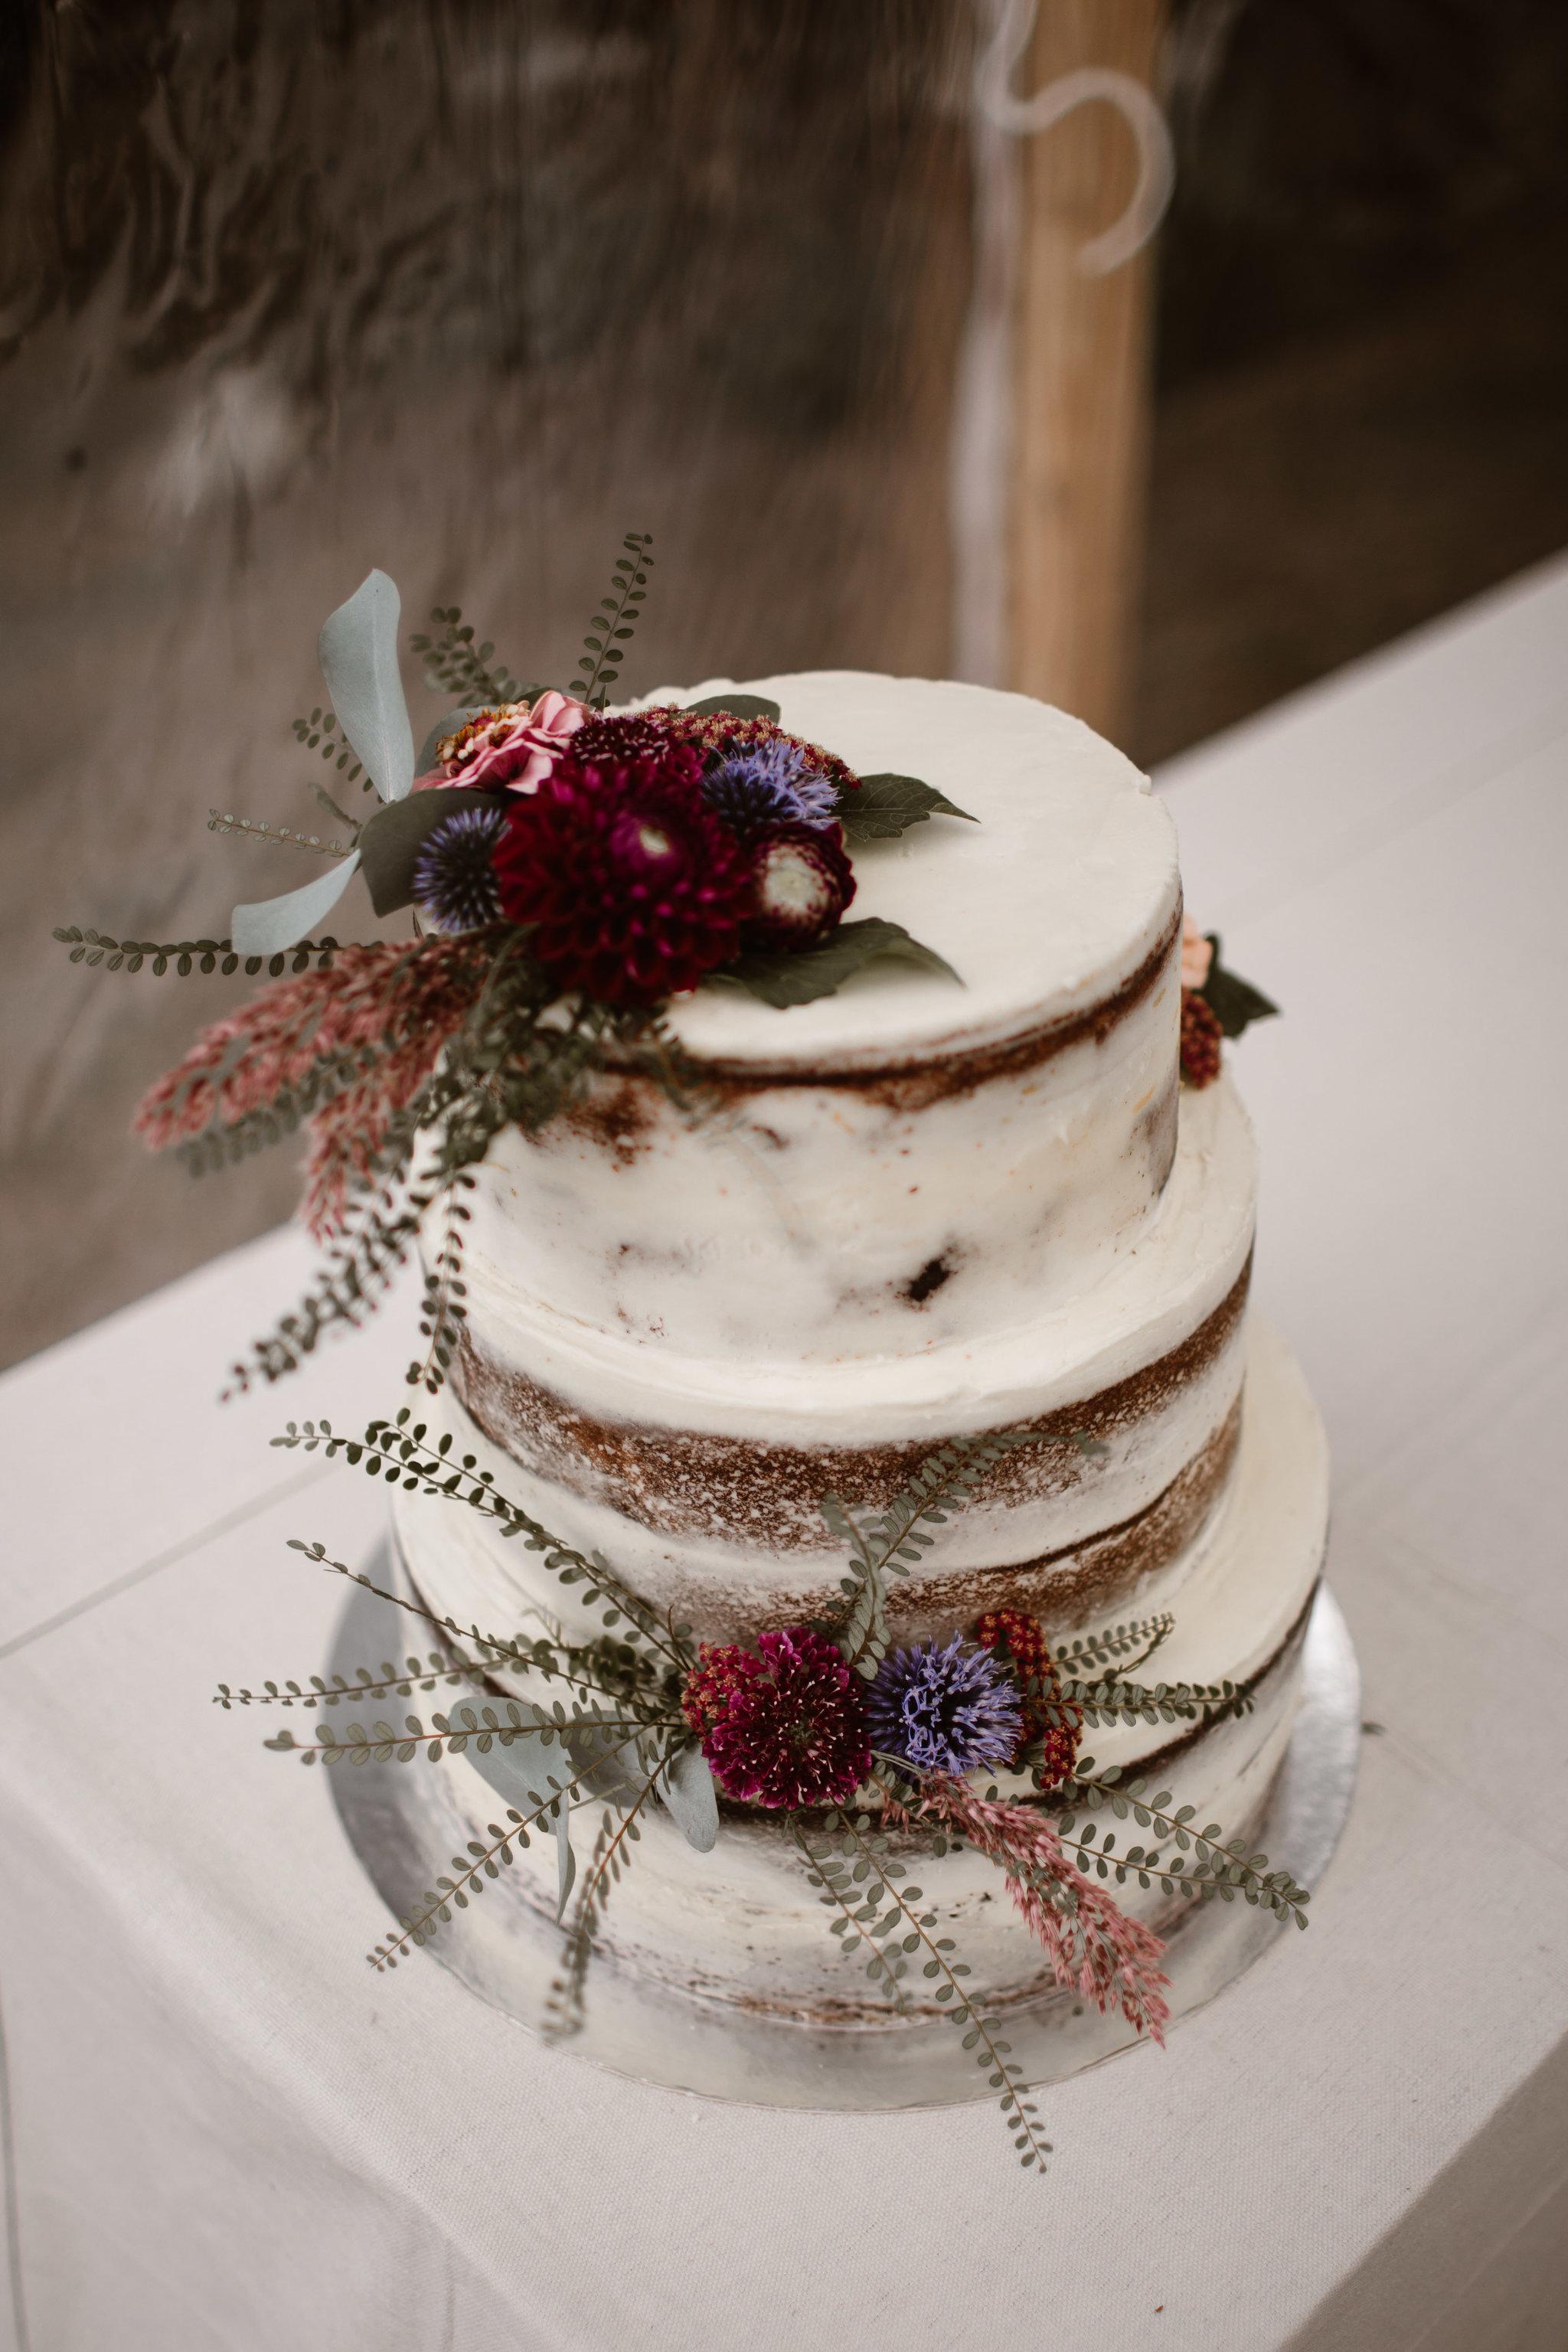 Categories: Weddings-Real Wedding: Faye & James - Photography by Francine Boer